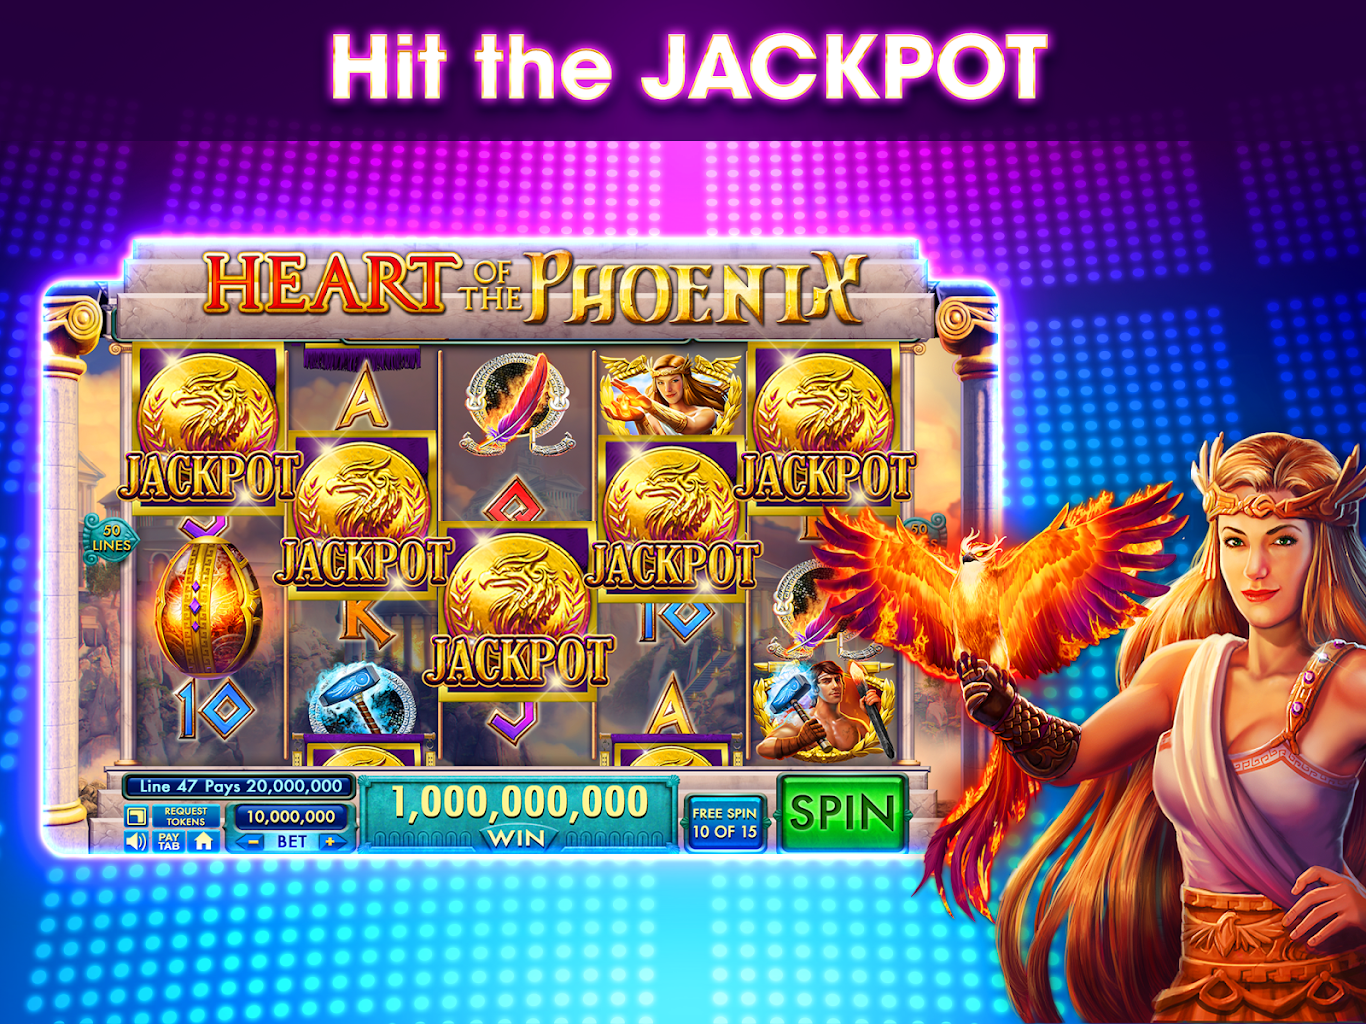 Gsn Casino Play Casino Games Slots Poker Bingo 4 13 1 Apk